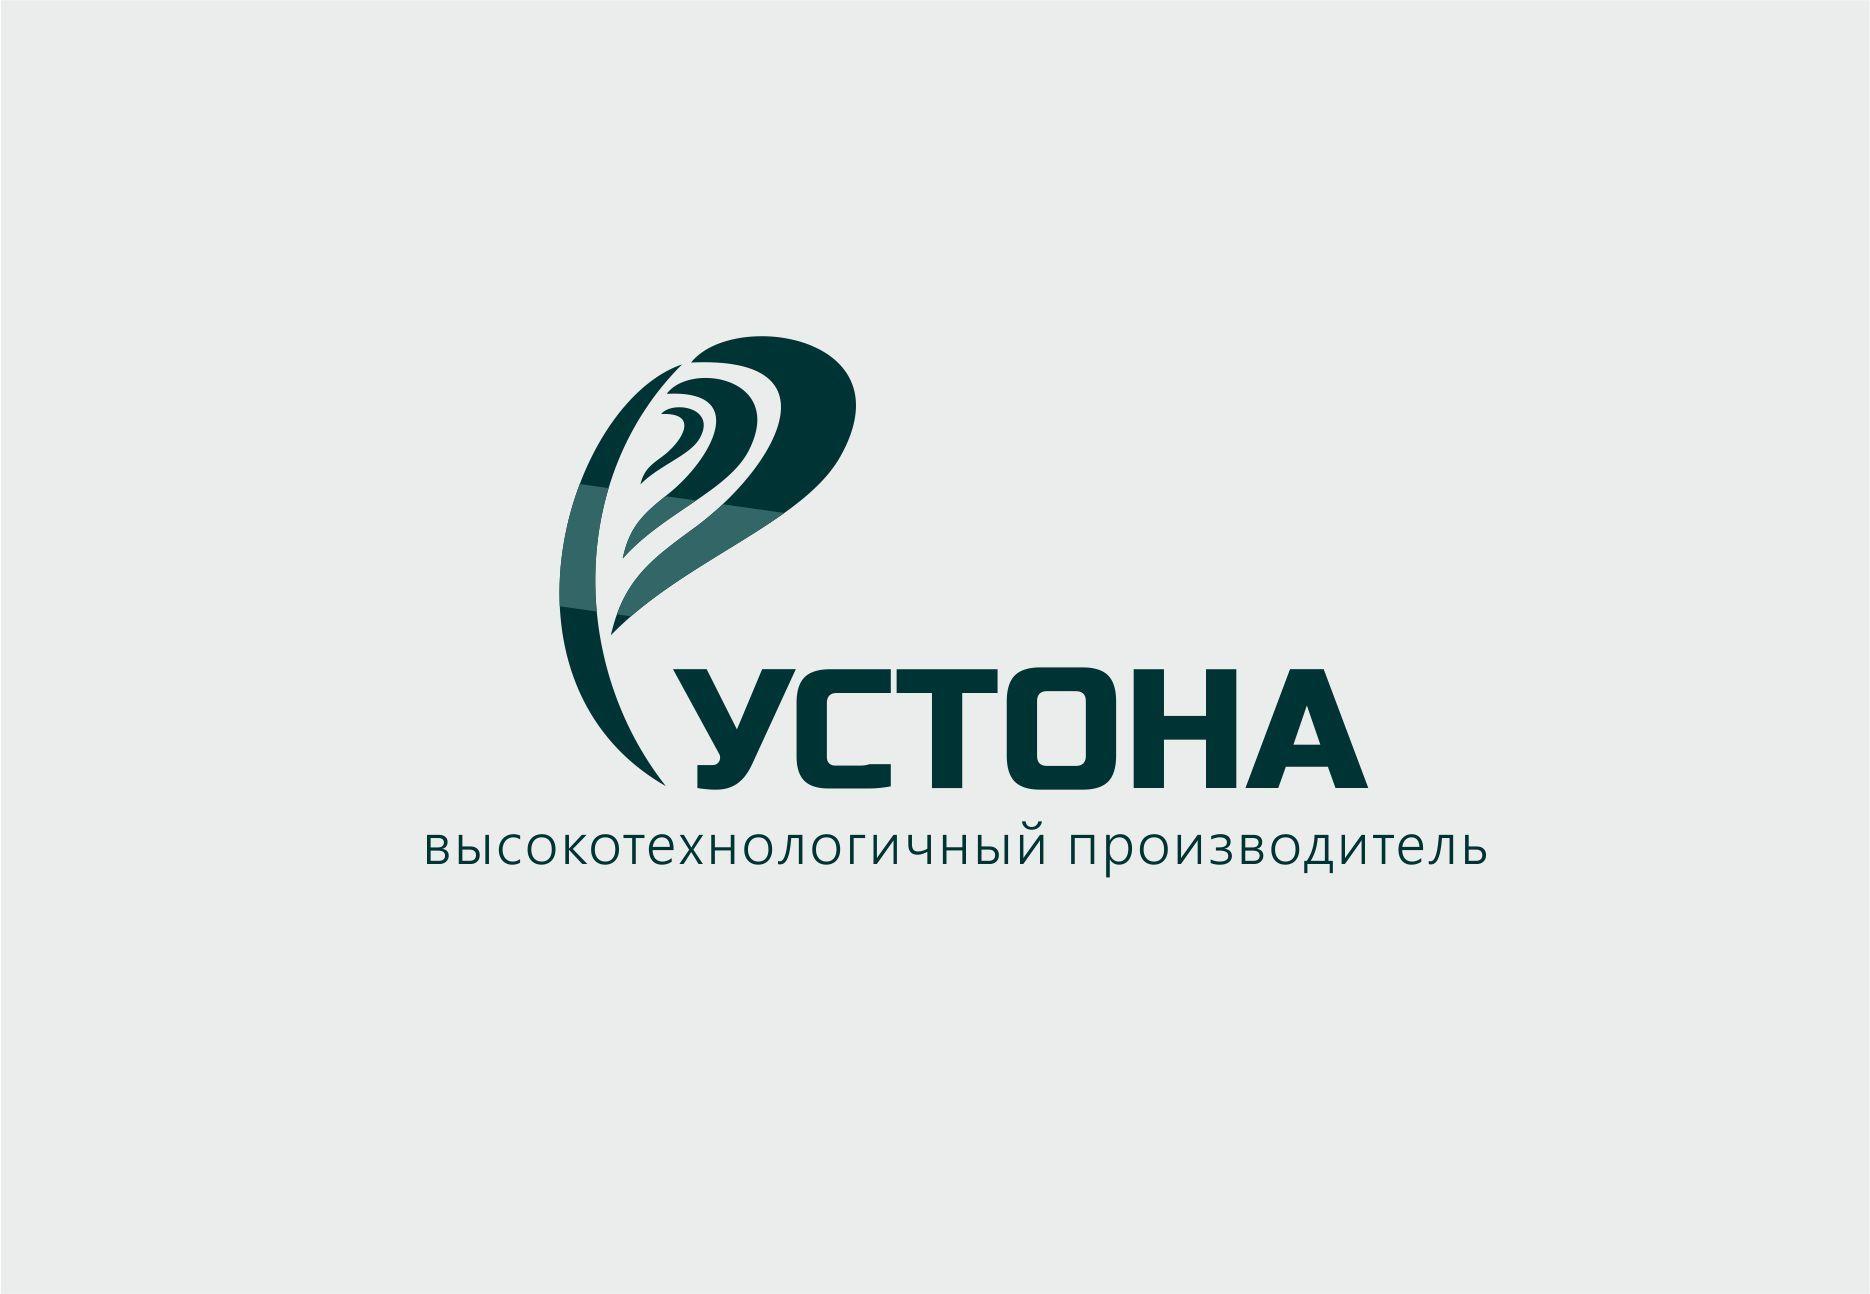 Логотип для компании Рустона (www.rustona.com) - дизайнер DaryaVladi